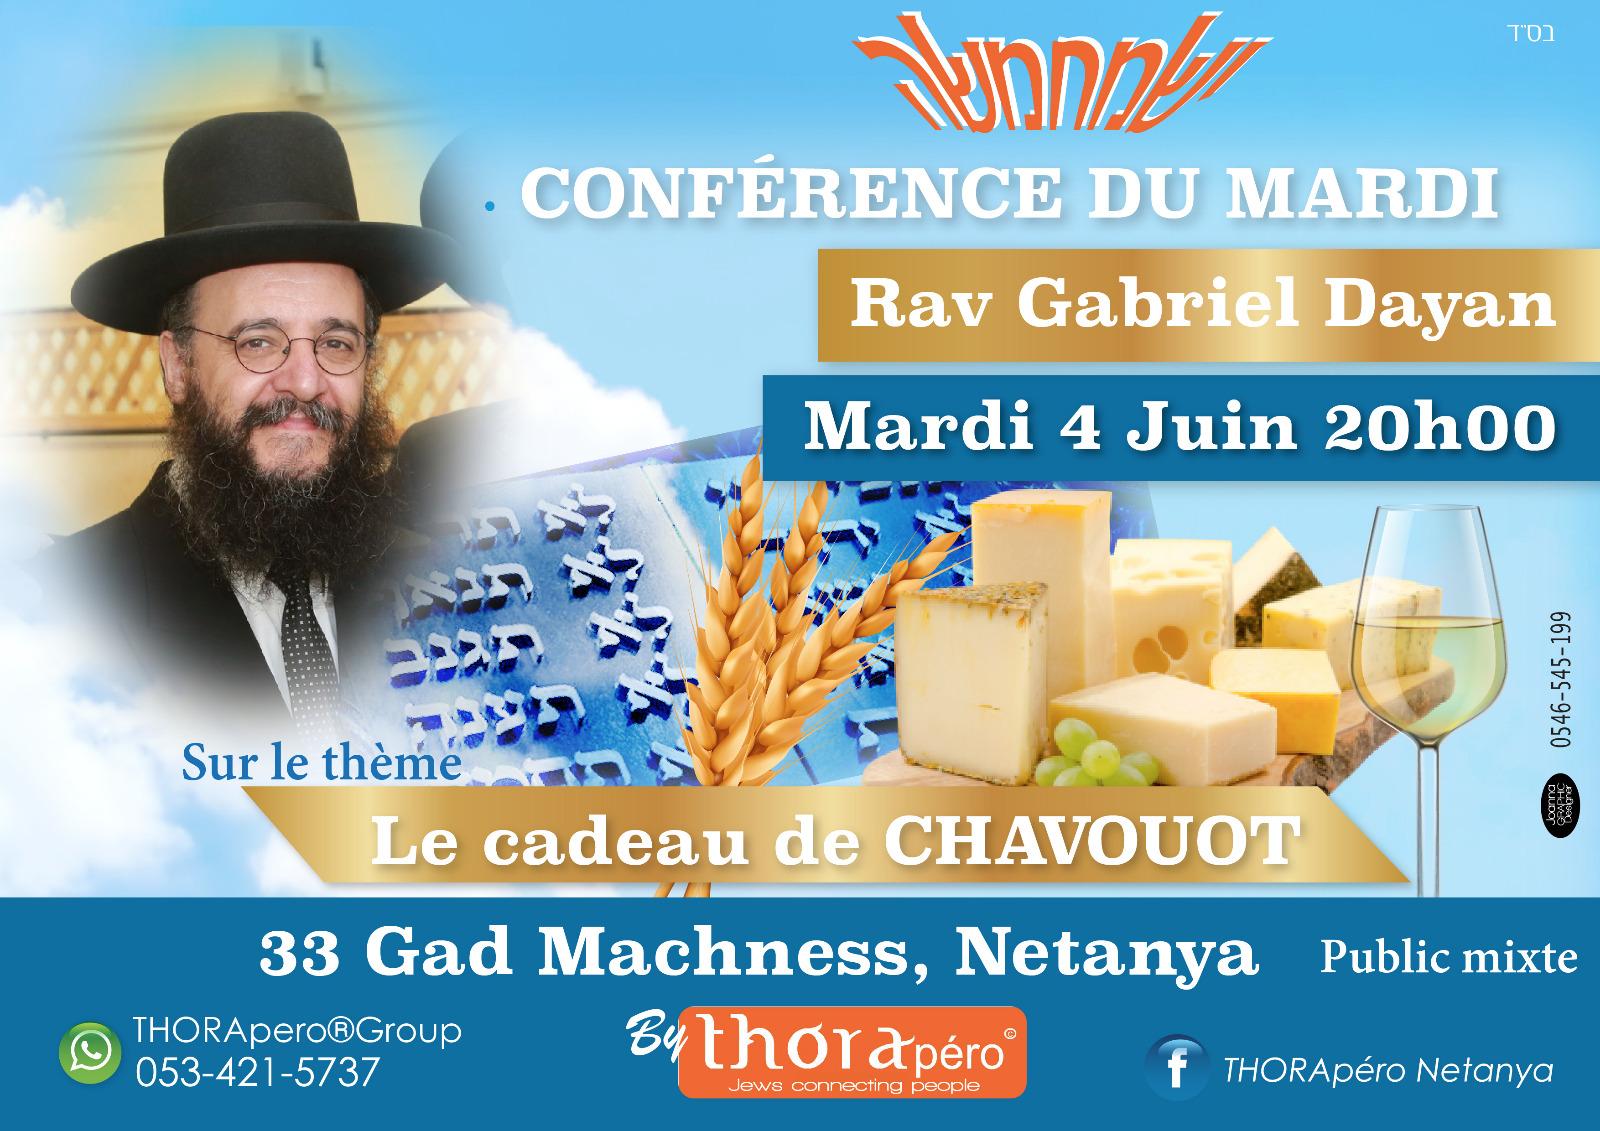 Conférence Du Mardi Avec Rav Gabriel Dayan